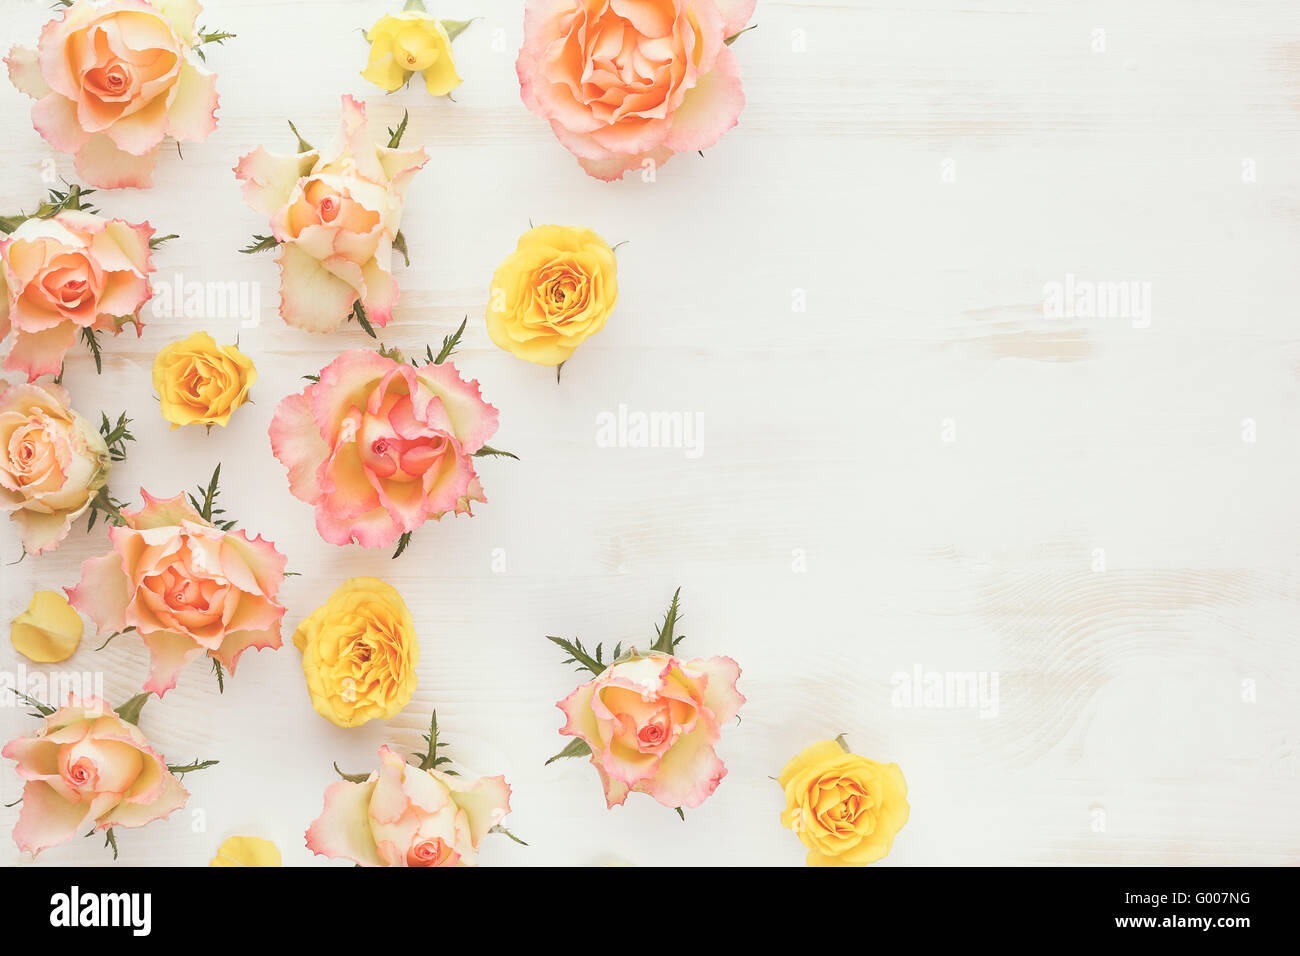 Vintage Fresh Rose Floral Background Various Type Of Flowers Arranged On Rustic Wood